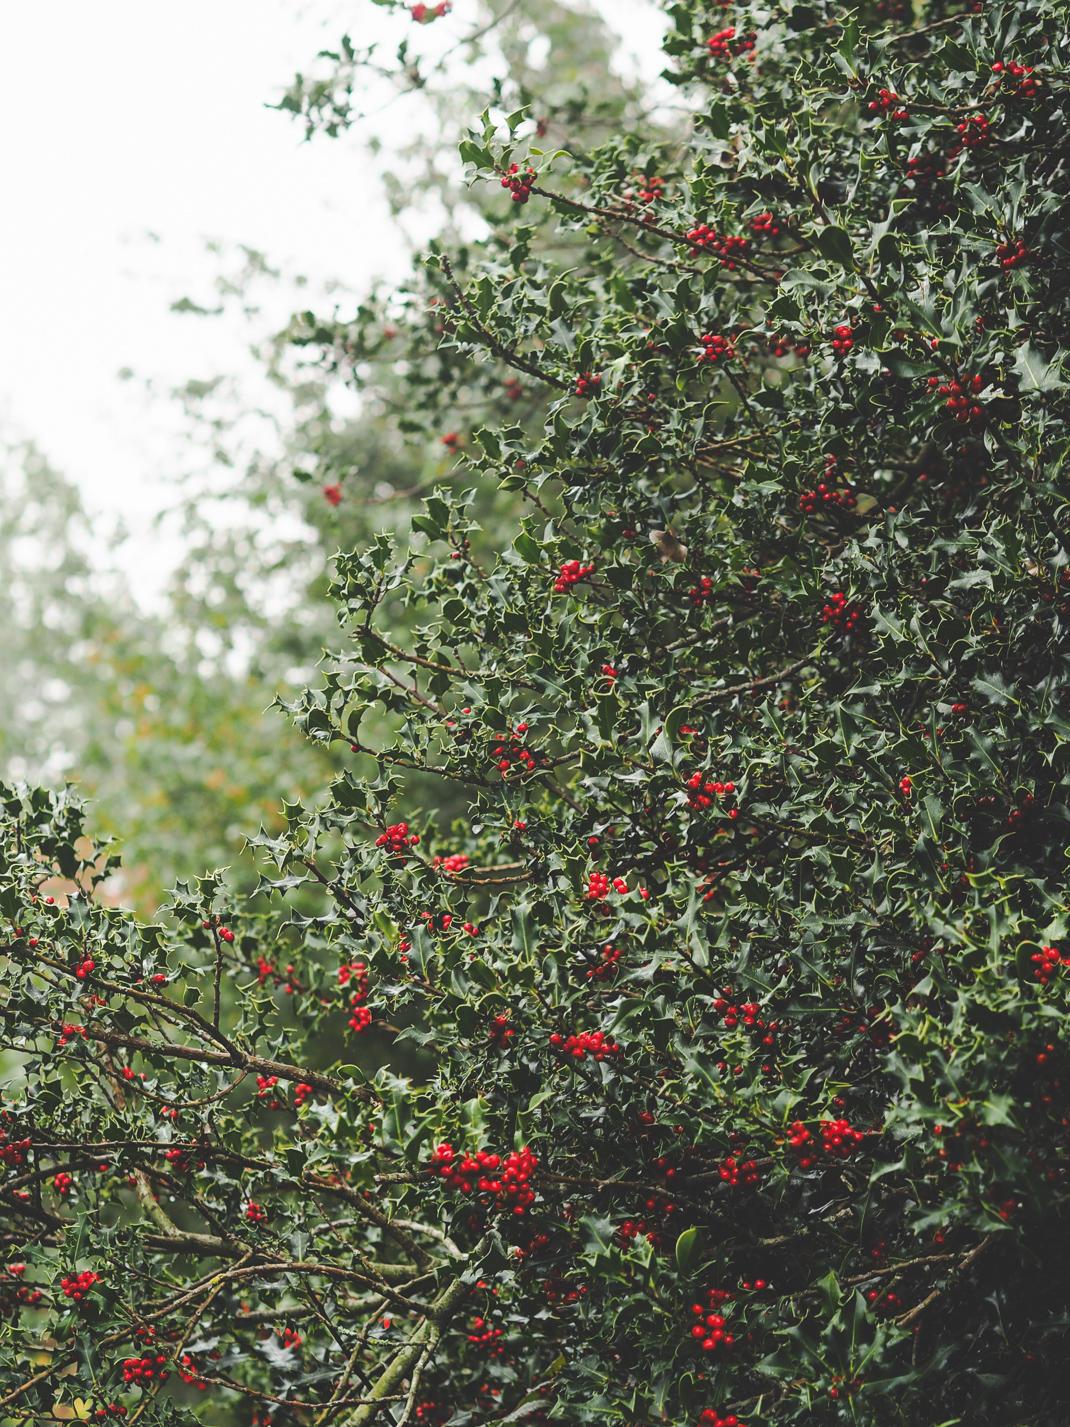 kew gardens holly bush